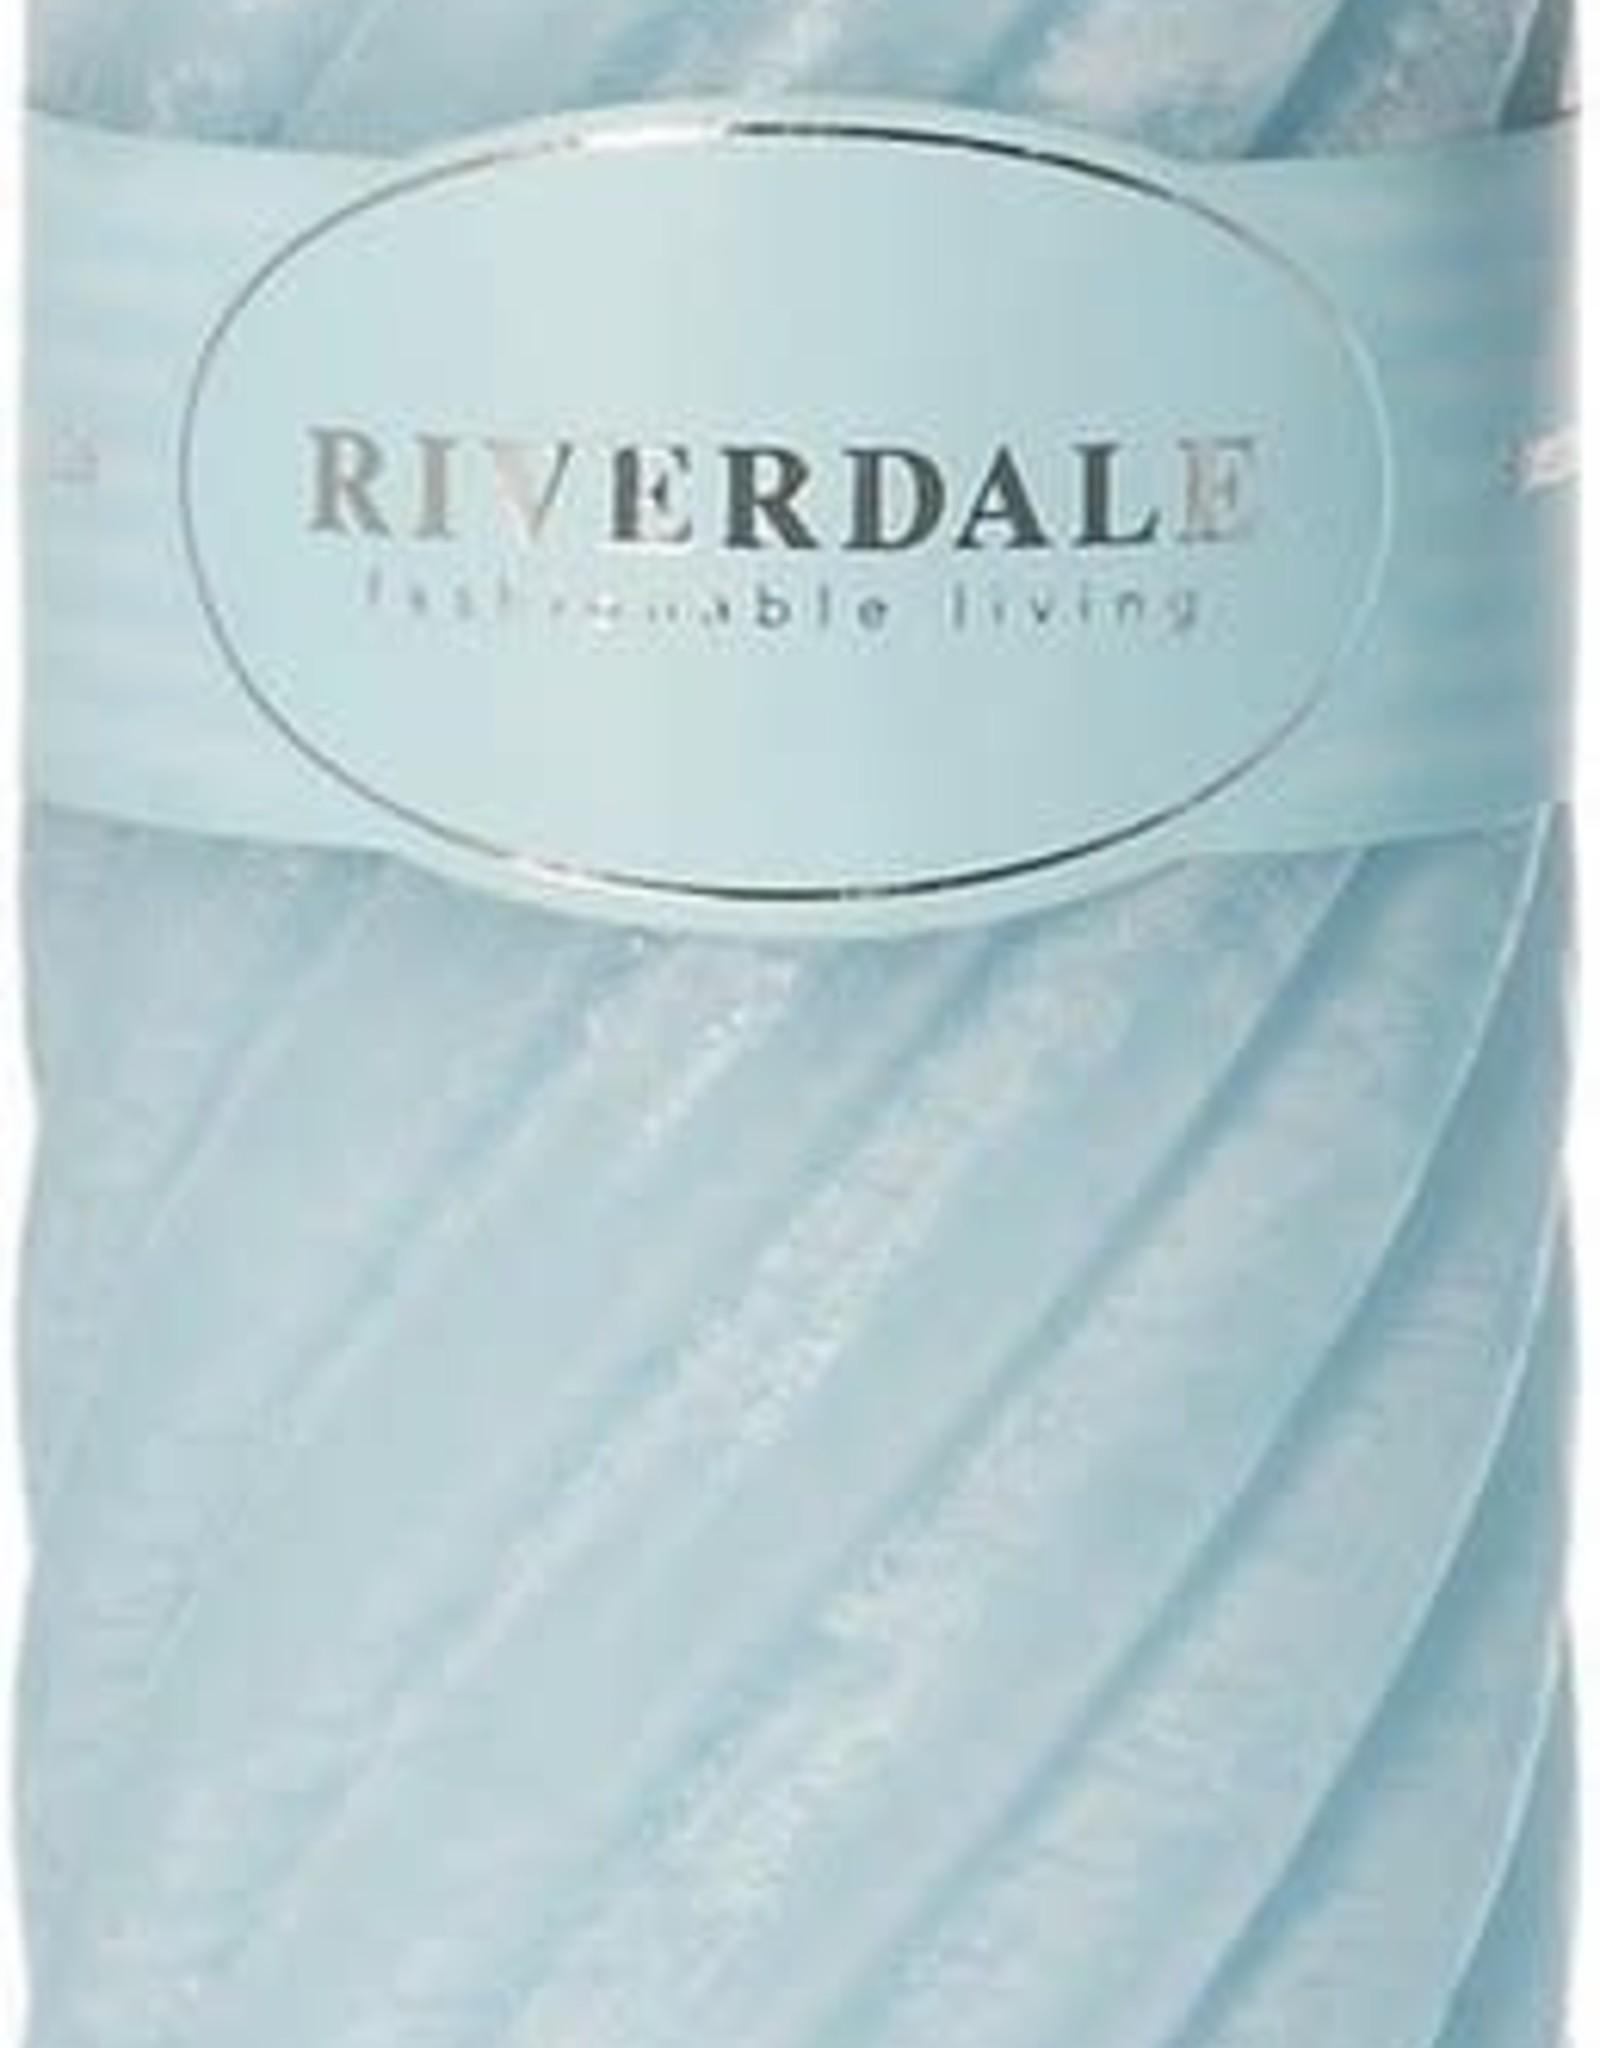 Riverdale Candle Swirl light 7.5x23cm